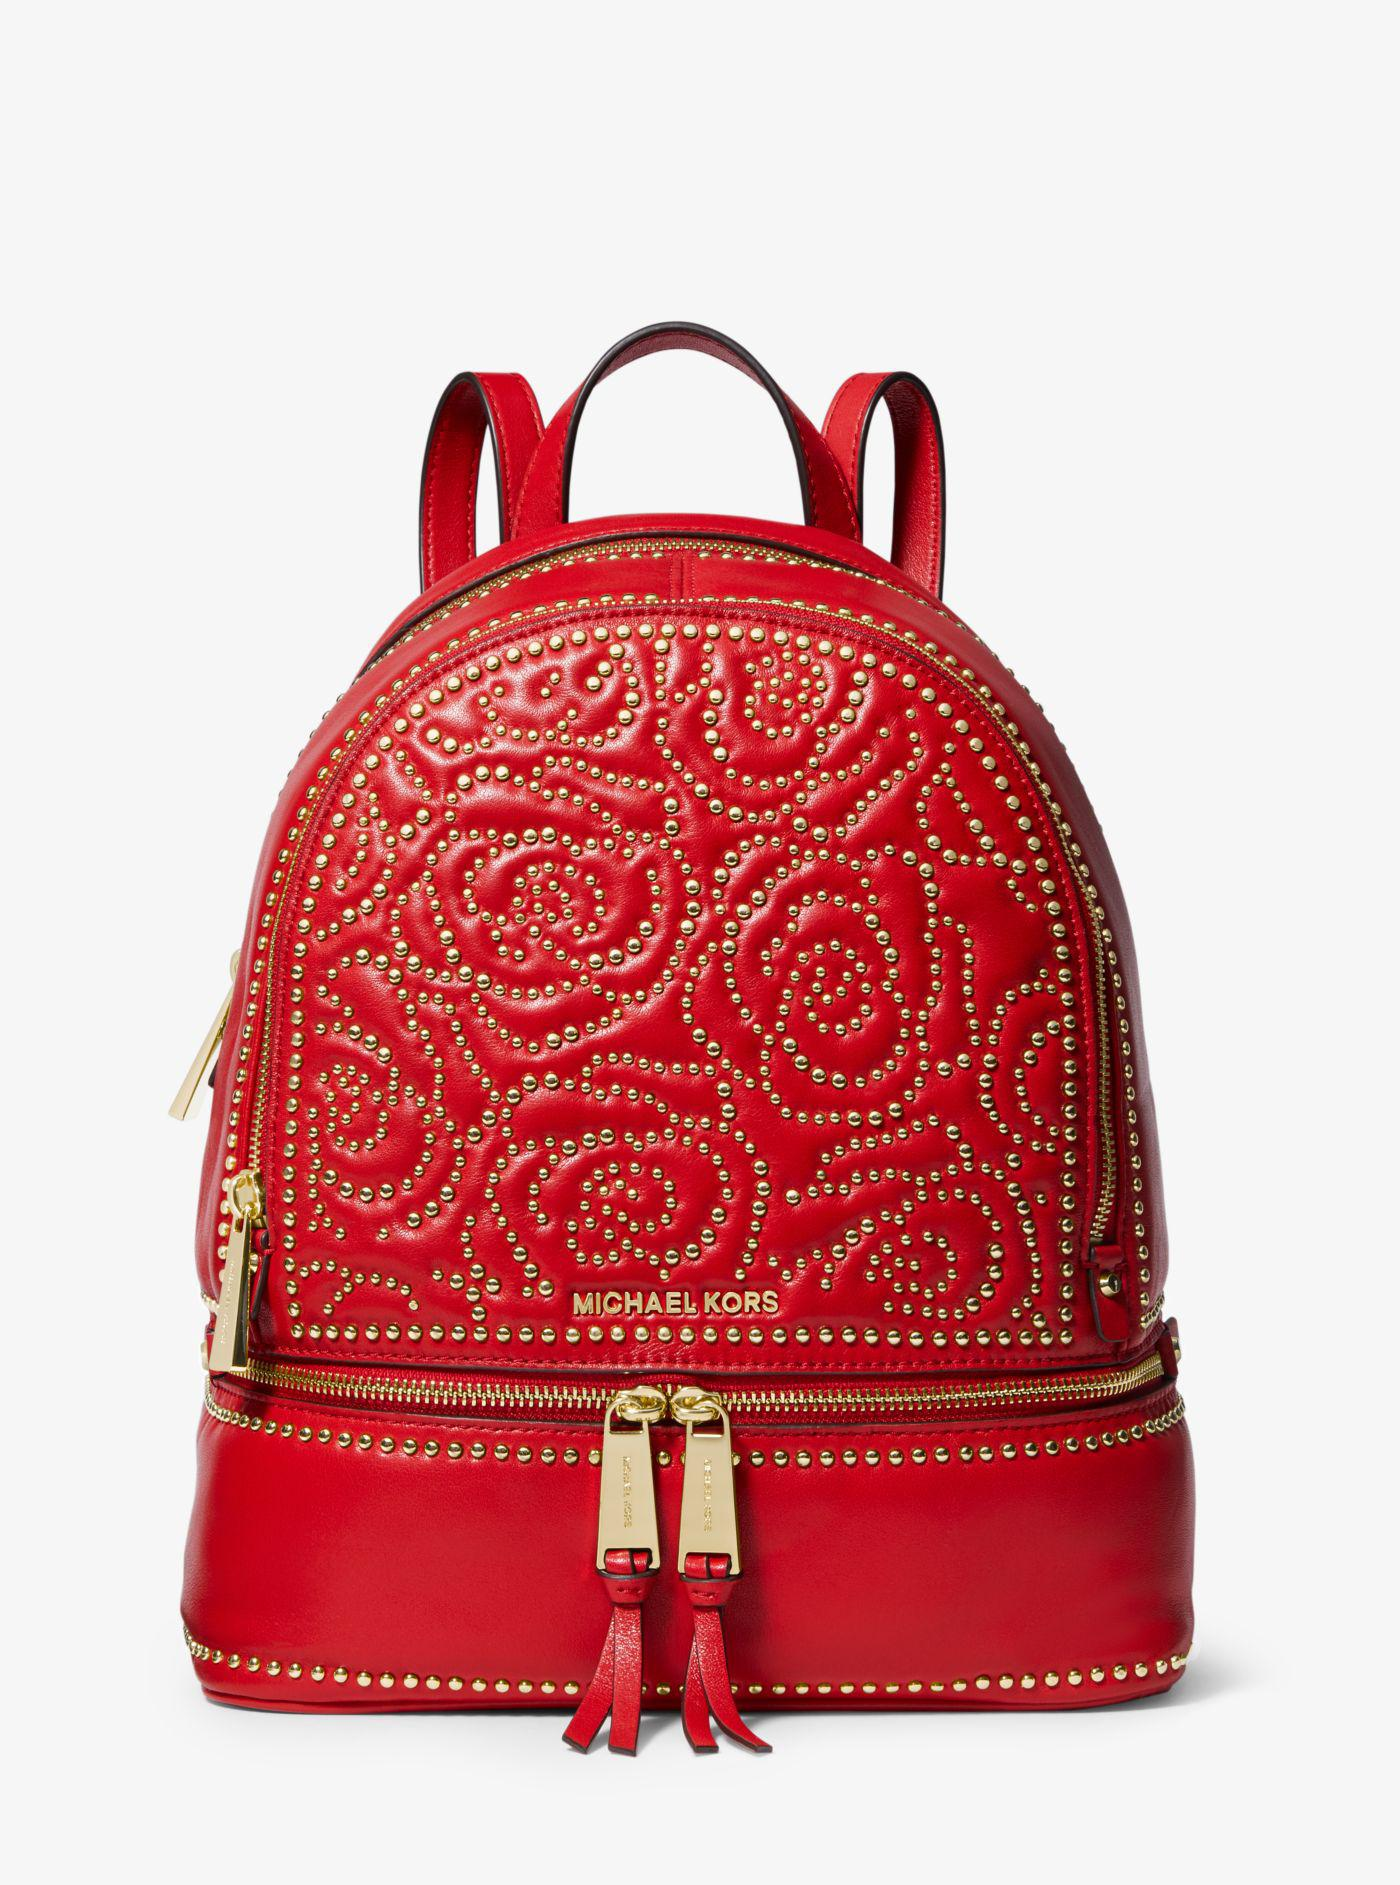 34aa6c6e29ad ... ireland michael kors red rhea medium rose studded leather backpack lyst.  view fullscreen b9ee3 866a7